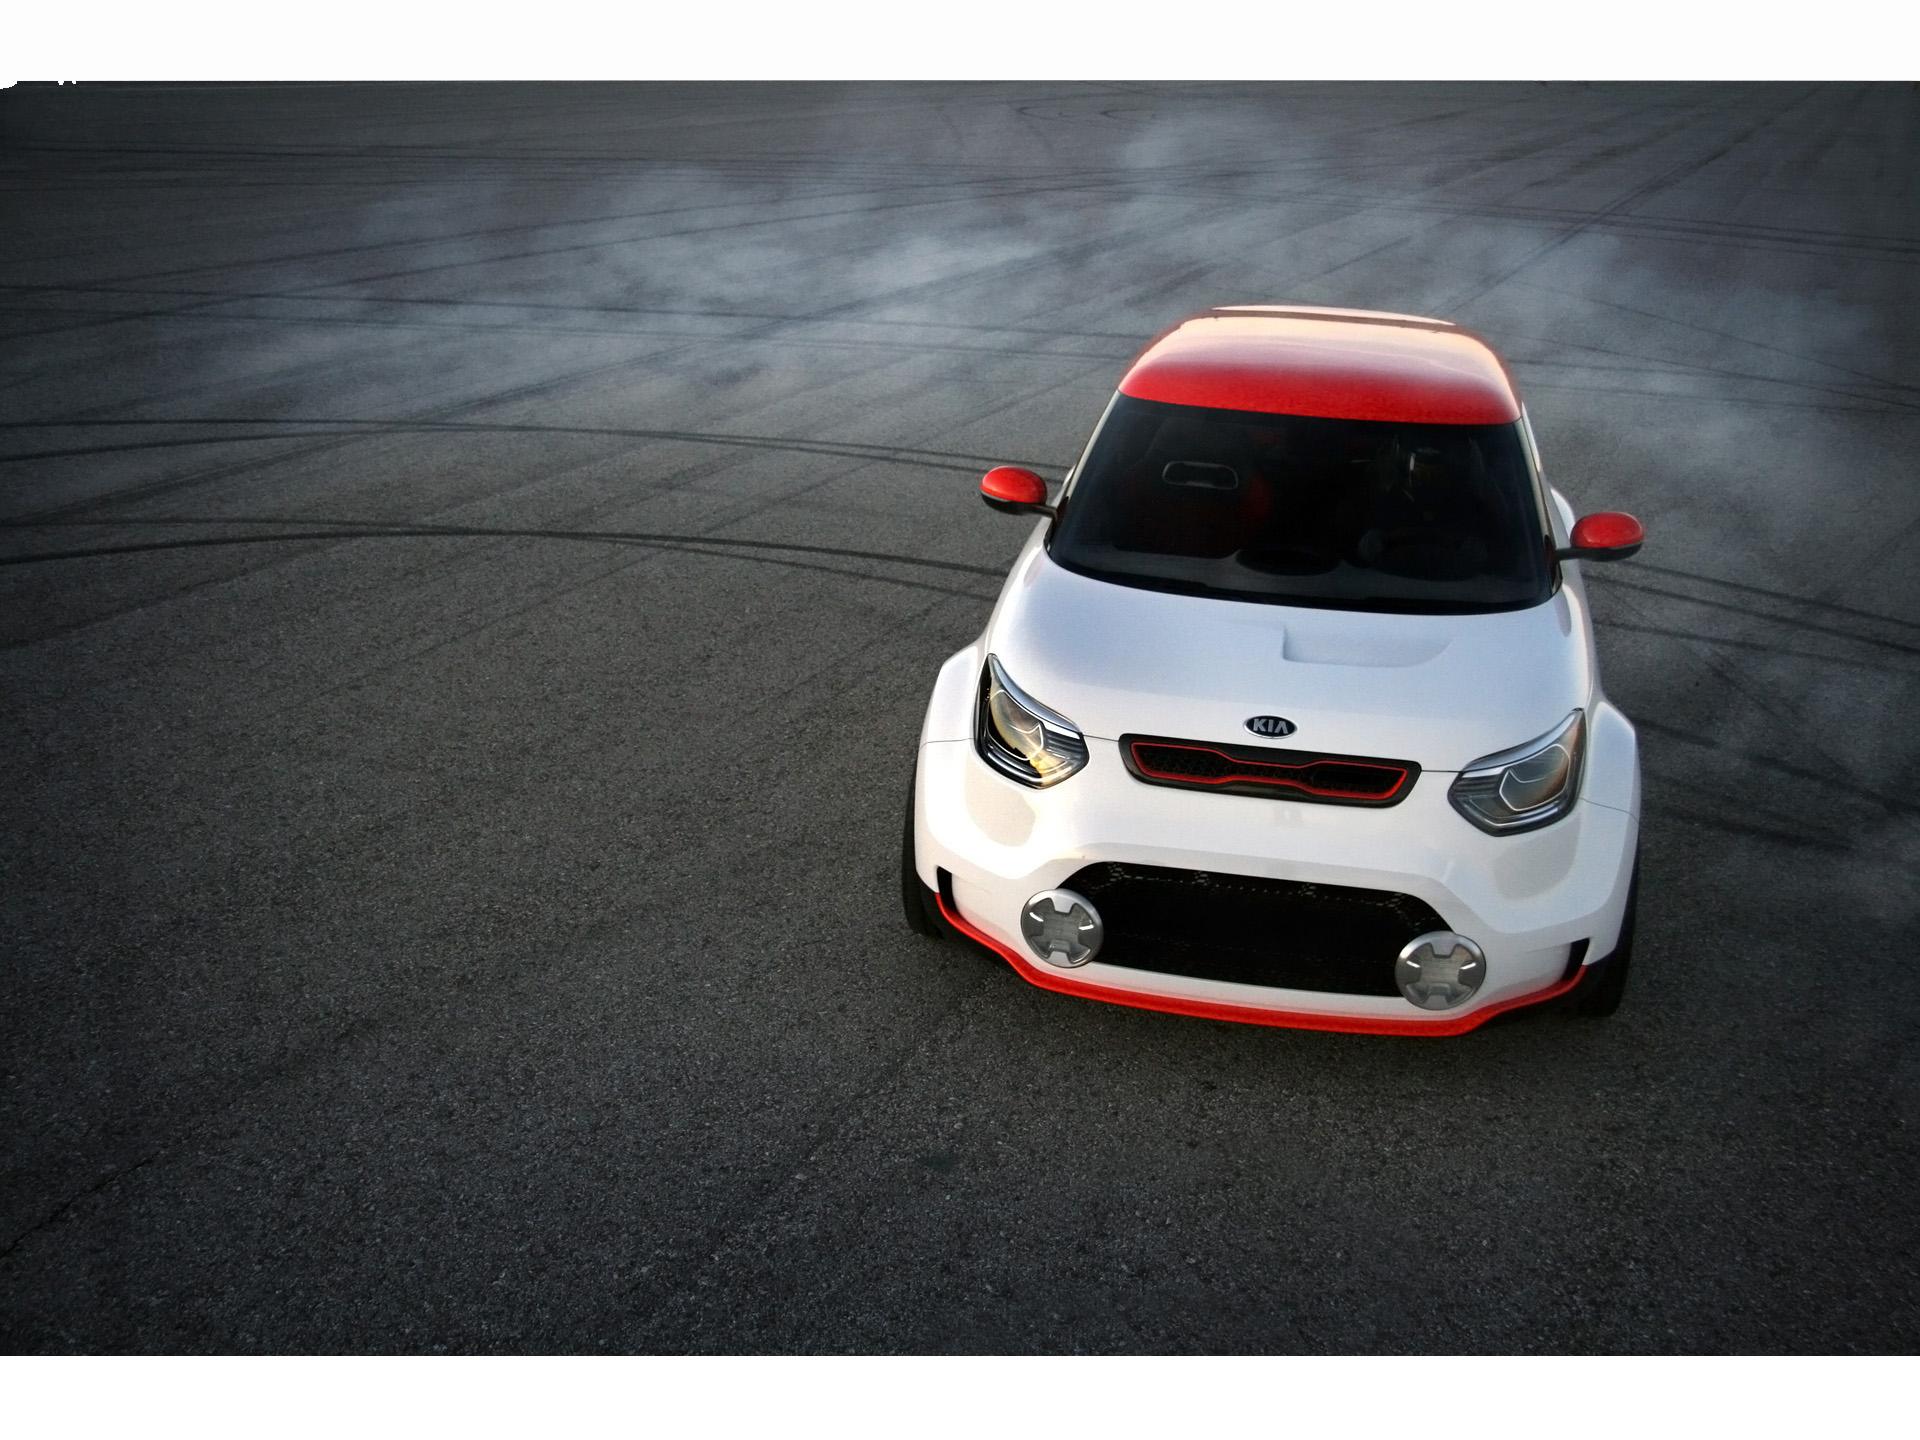 2012 Kia Trackster Concept Image